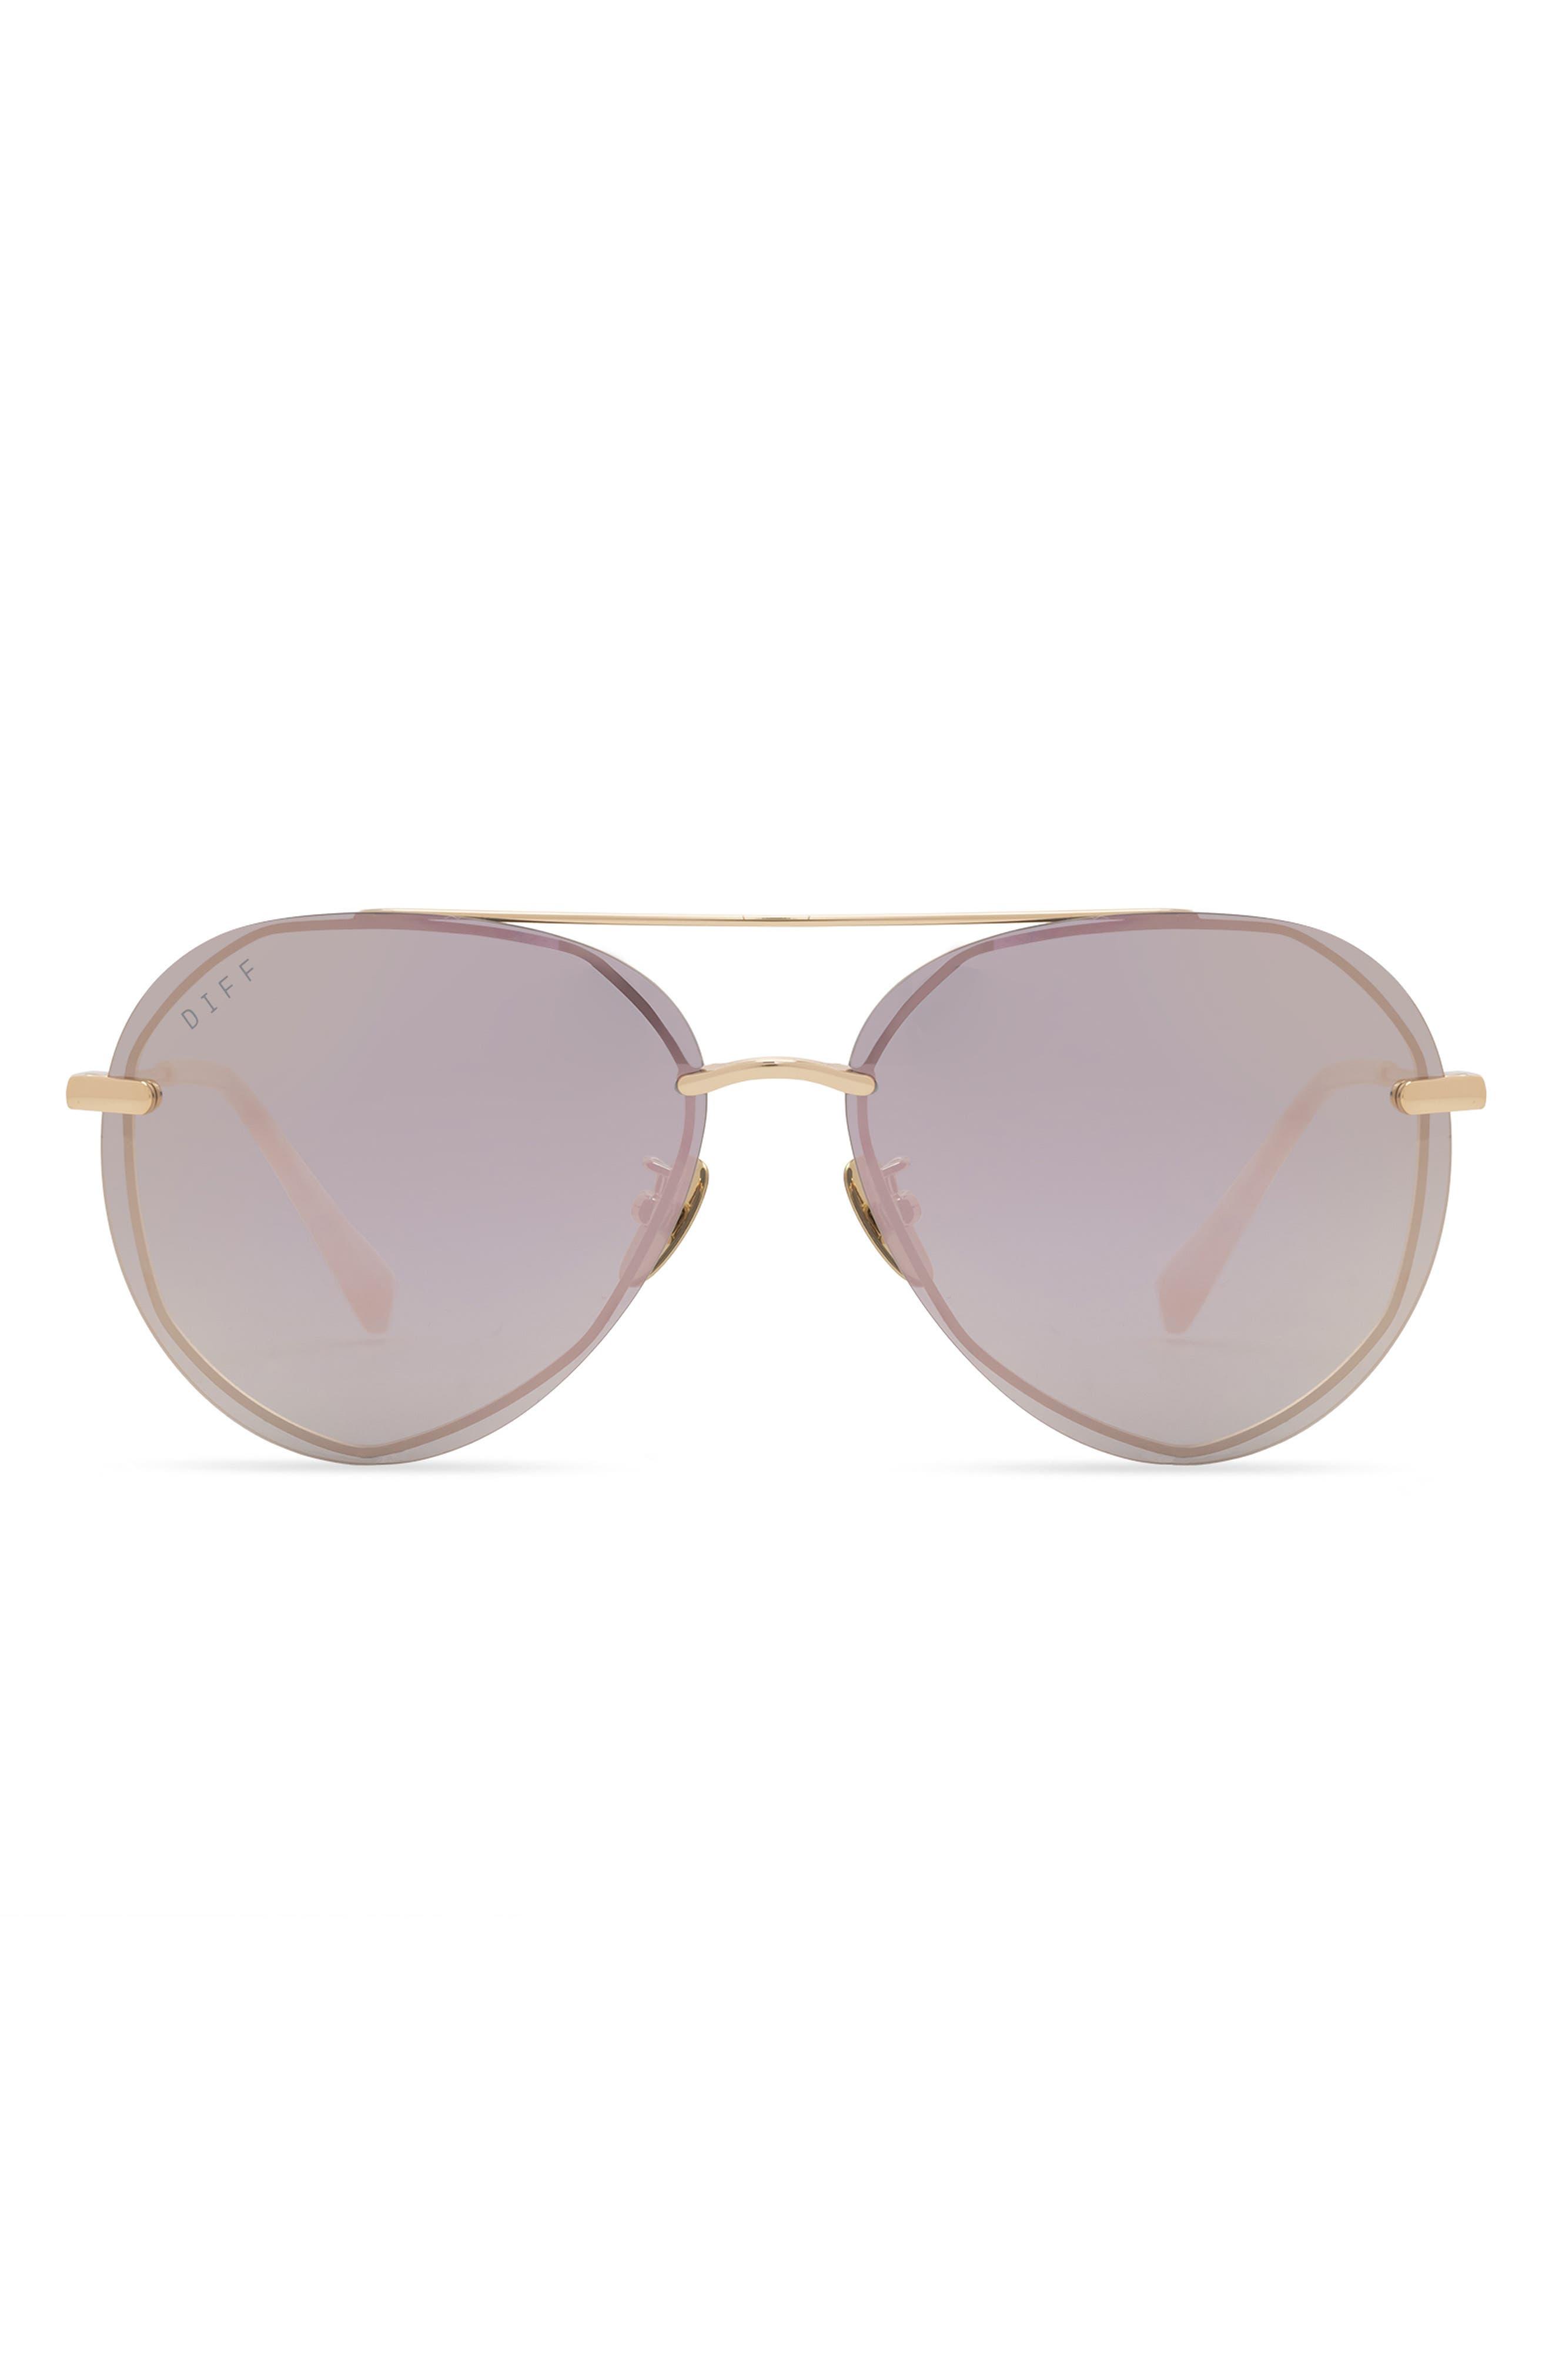 Lenox 62mm Oversize Polarized Aviator Sunglasses